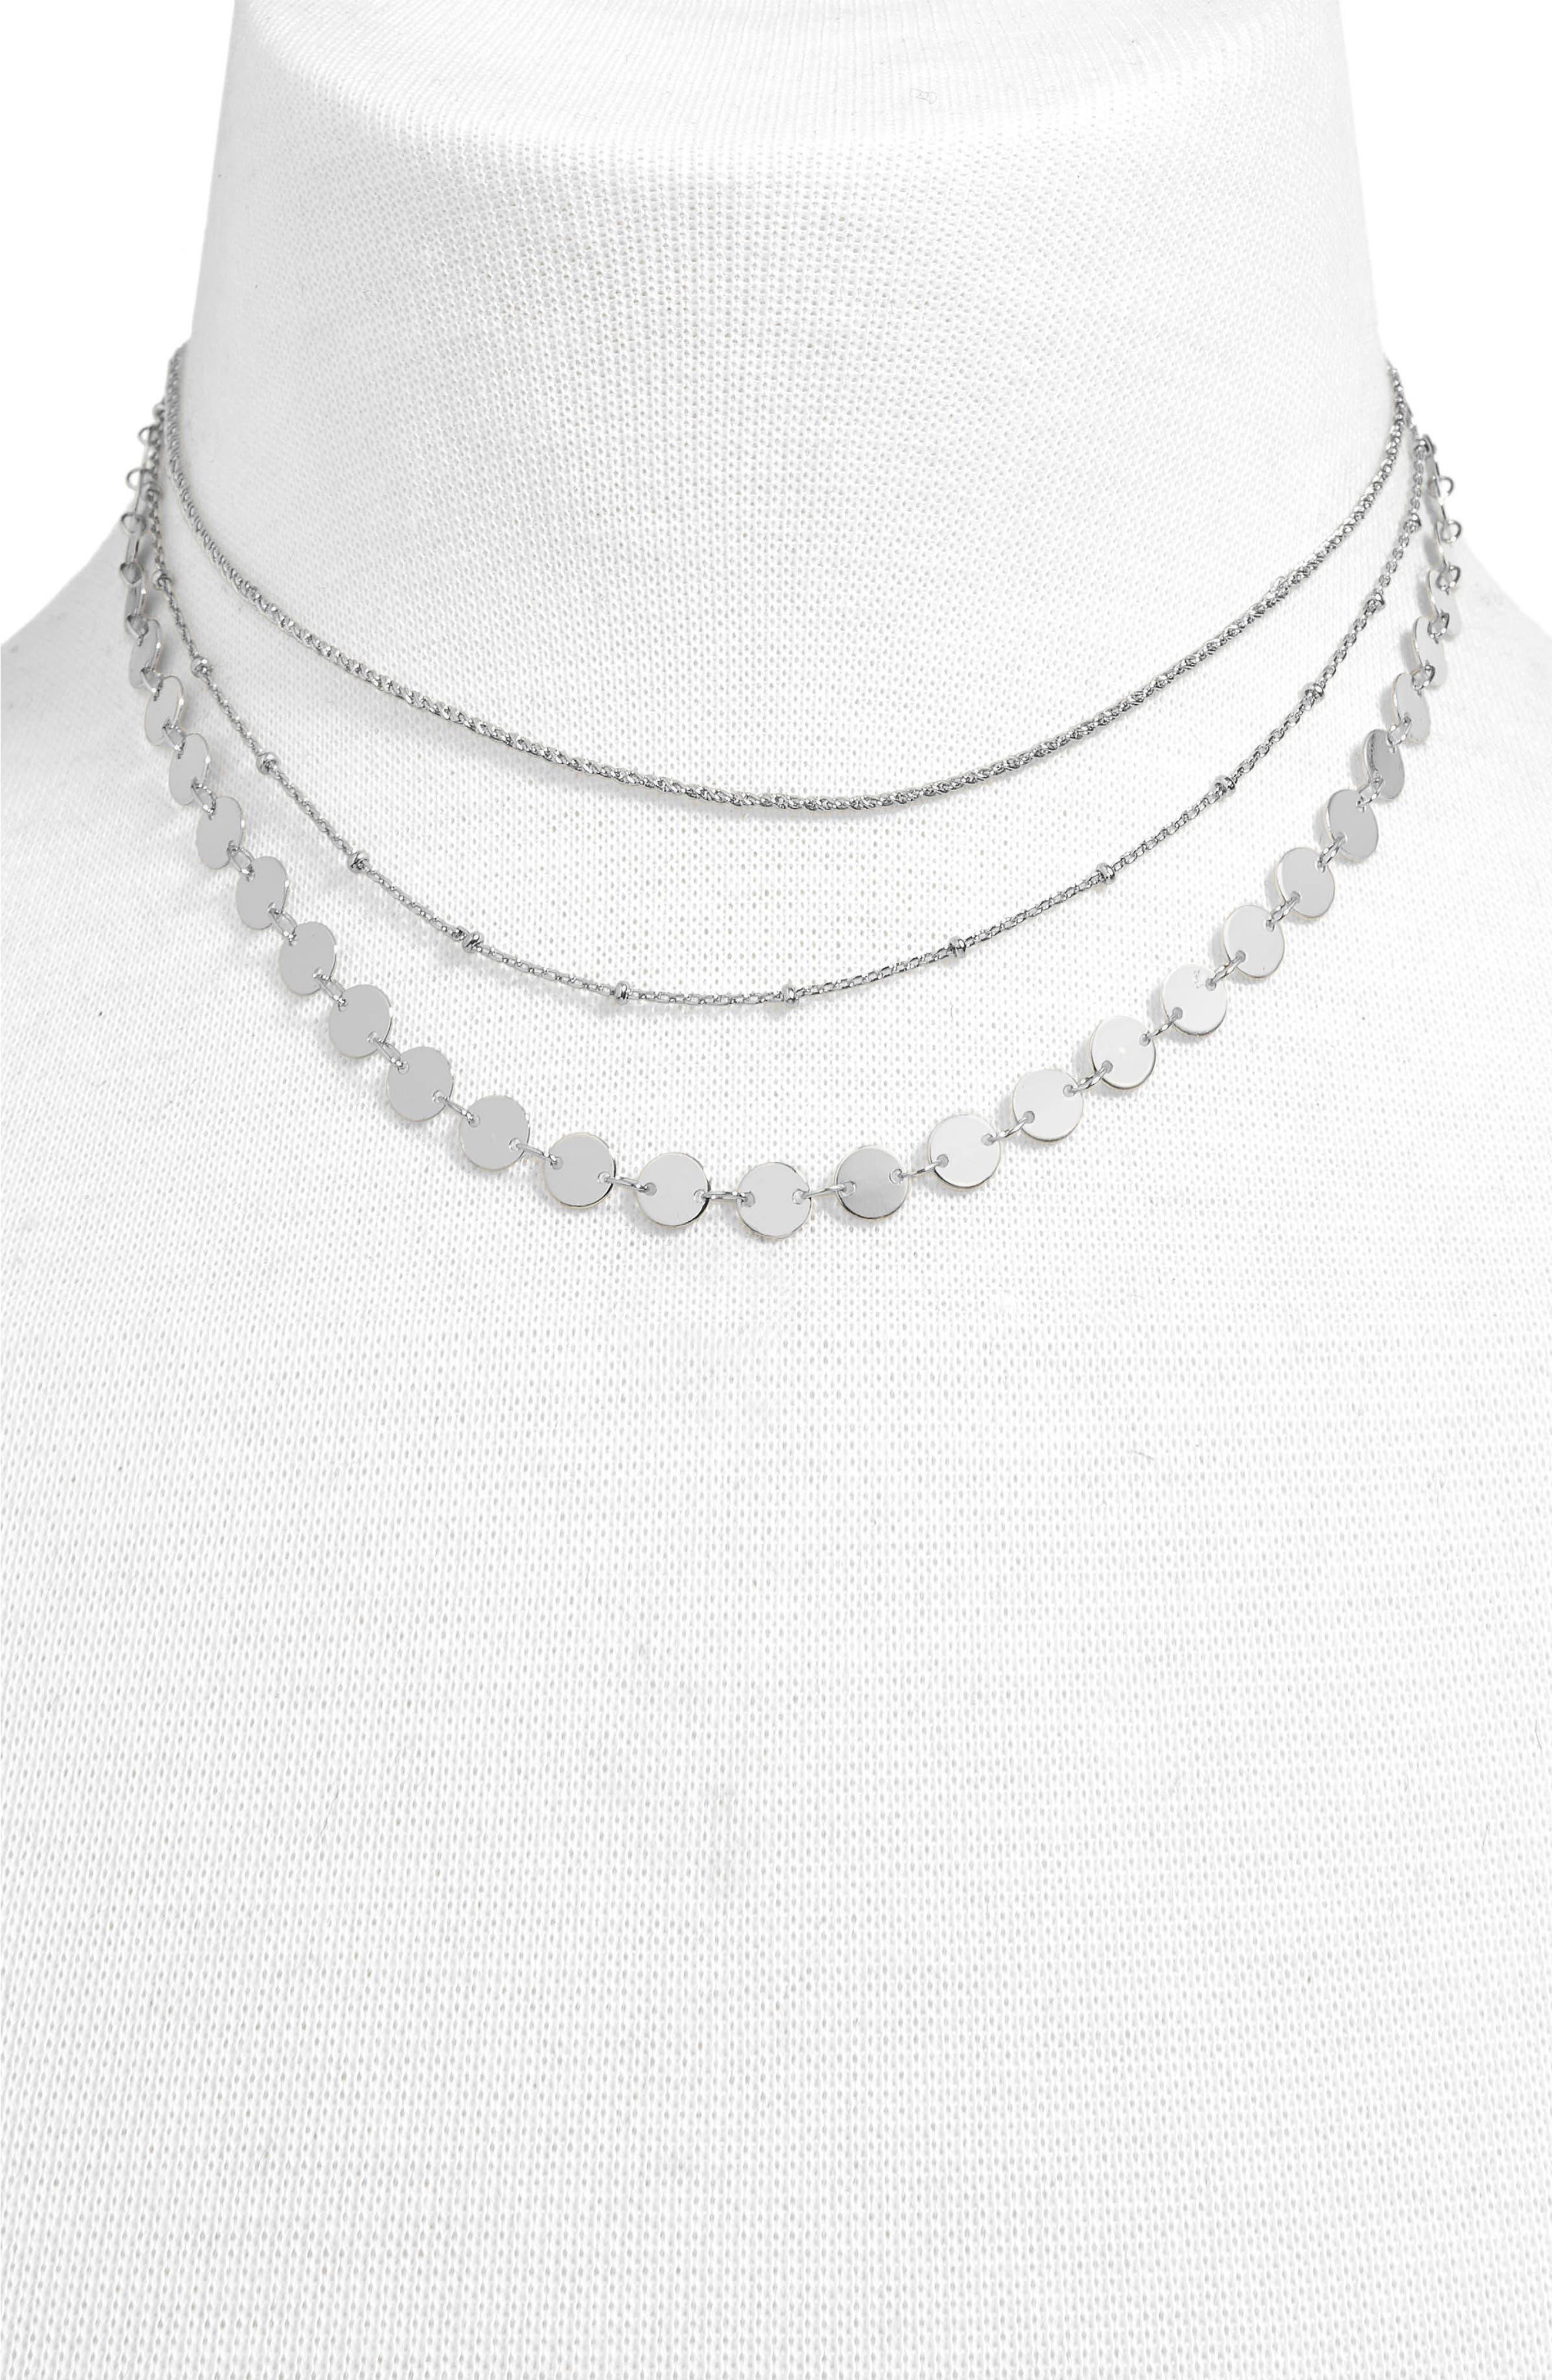 Sophia Layered Collar Necklace,                             Main thumbnail 1, color,                             040